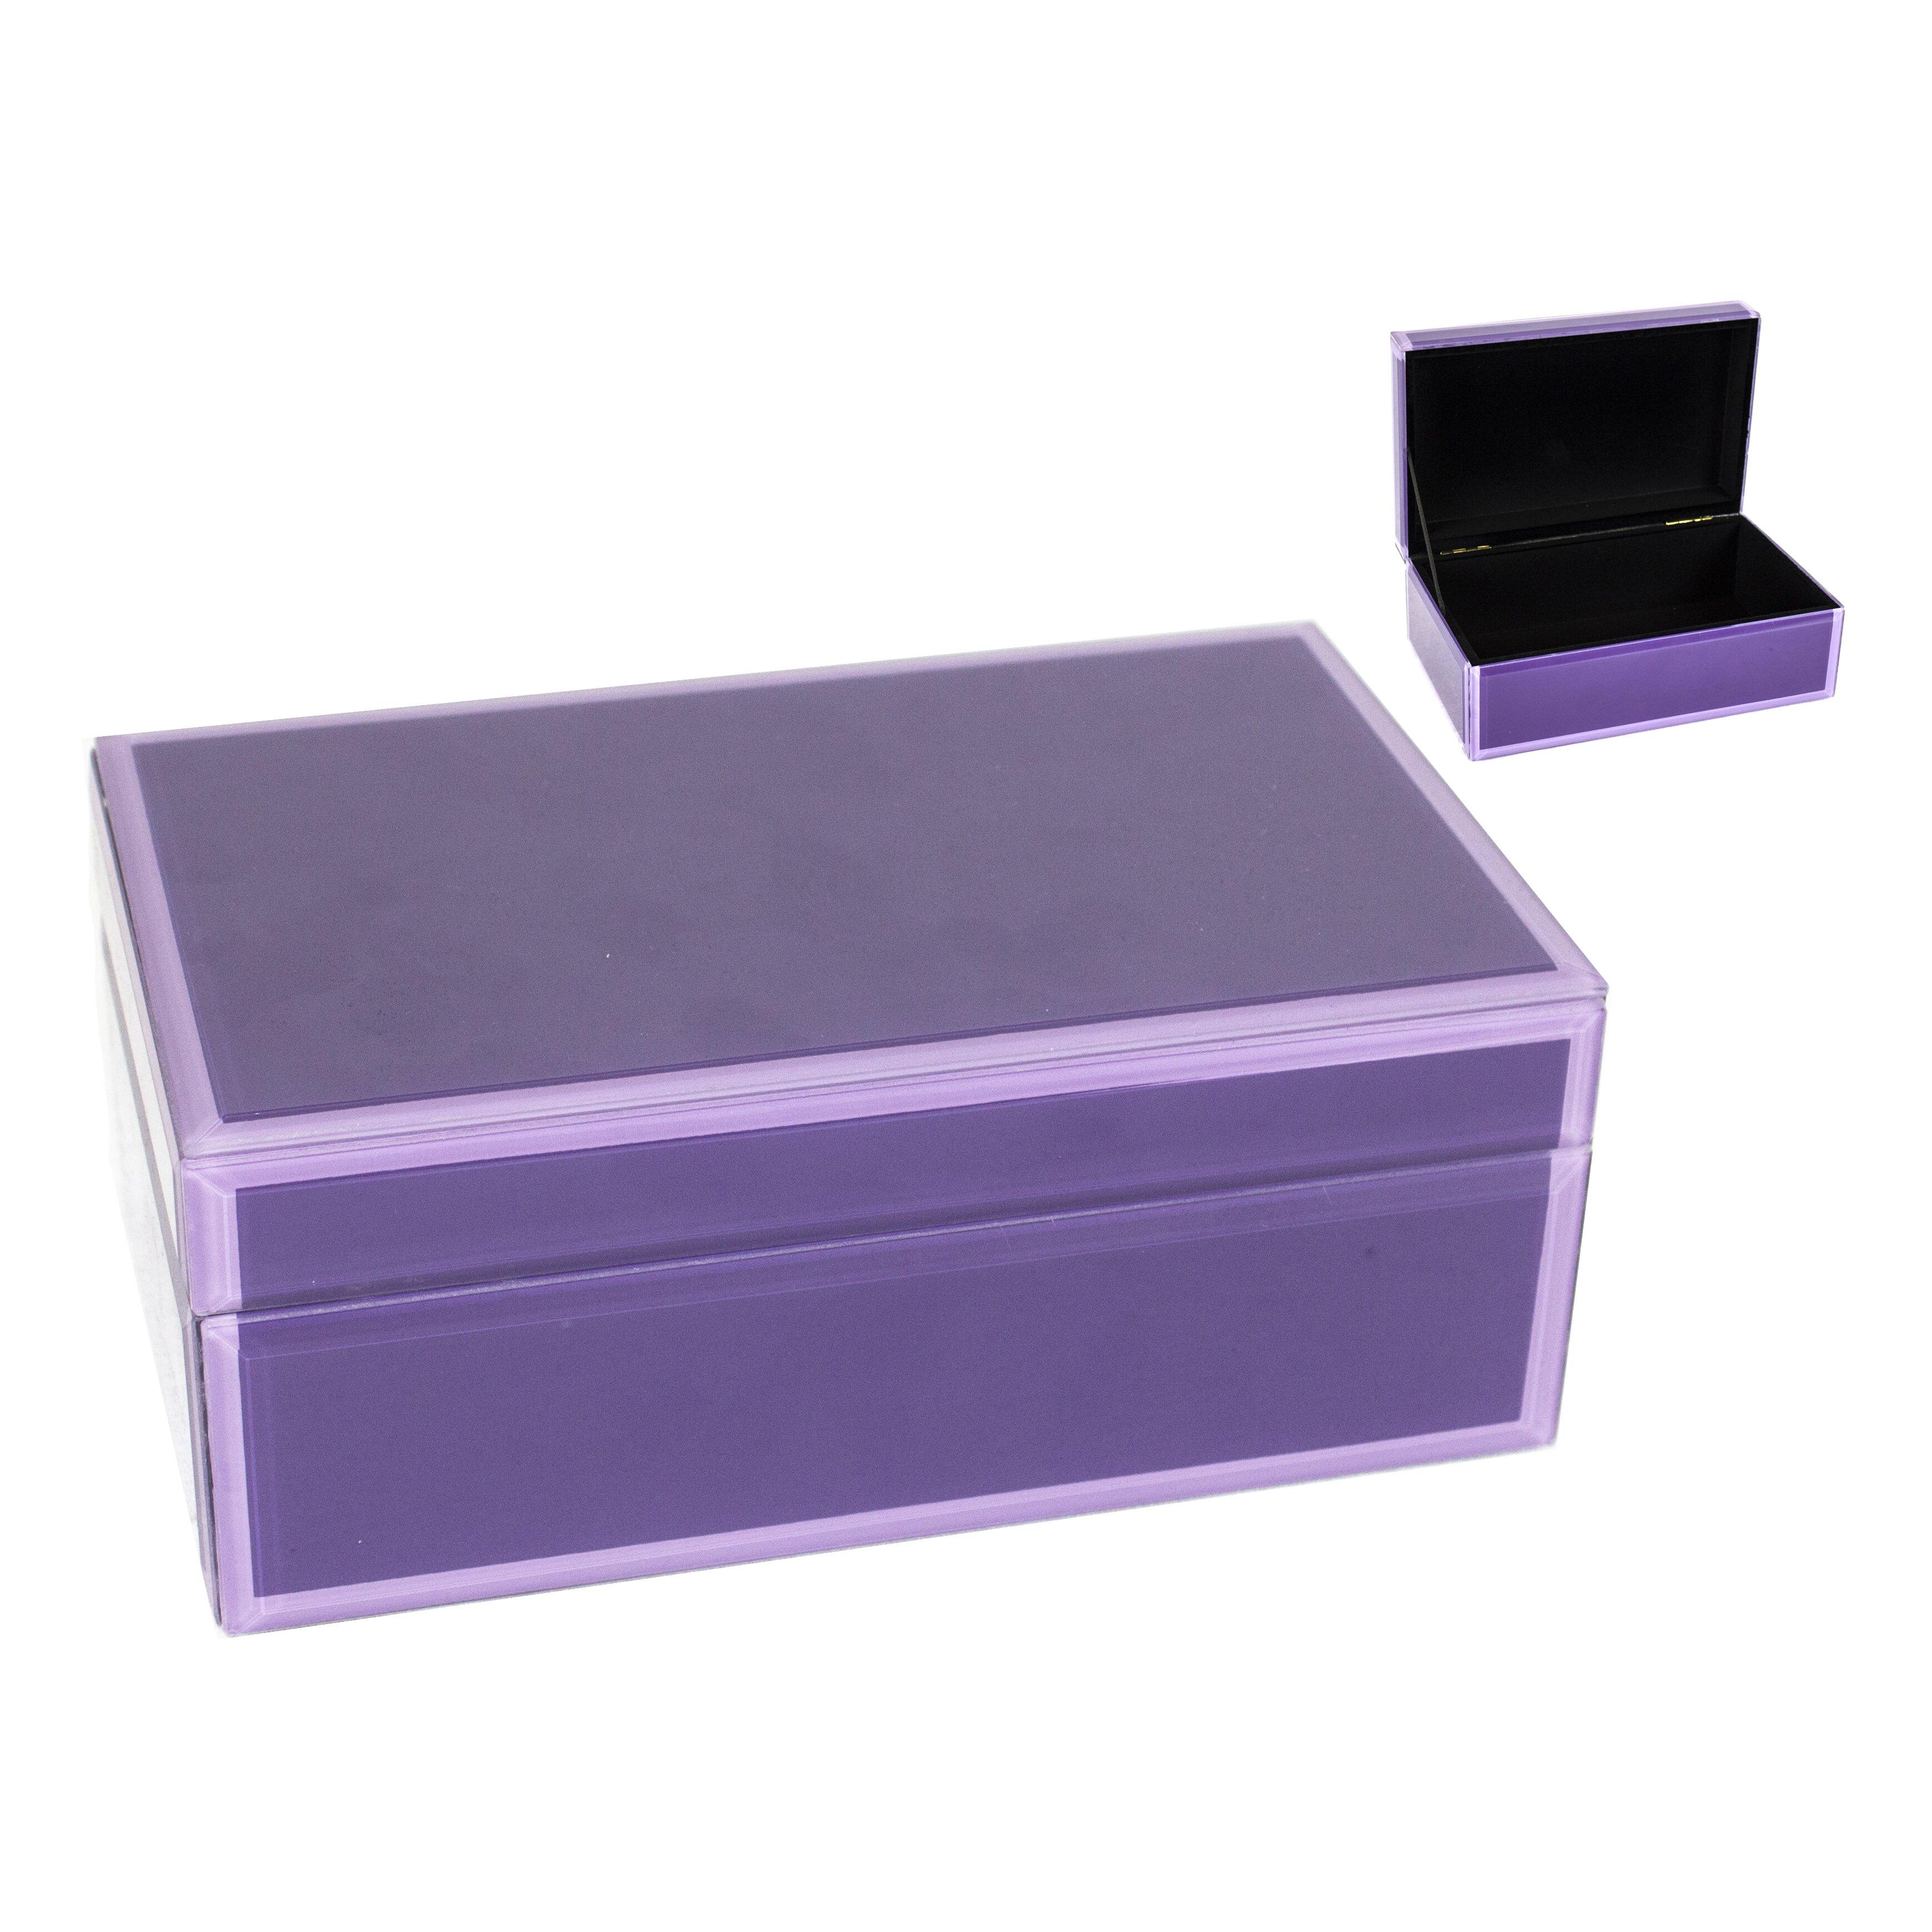 Sagebrookhome Decorative Jewelry Box Wayfair